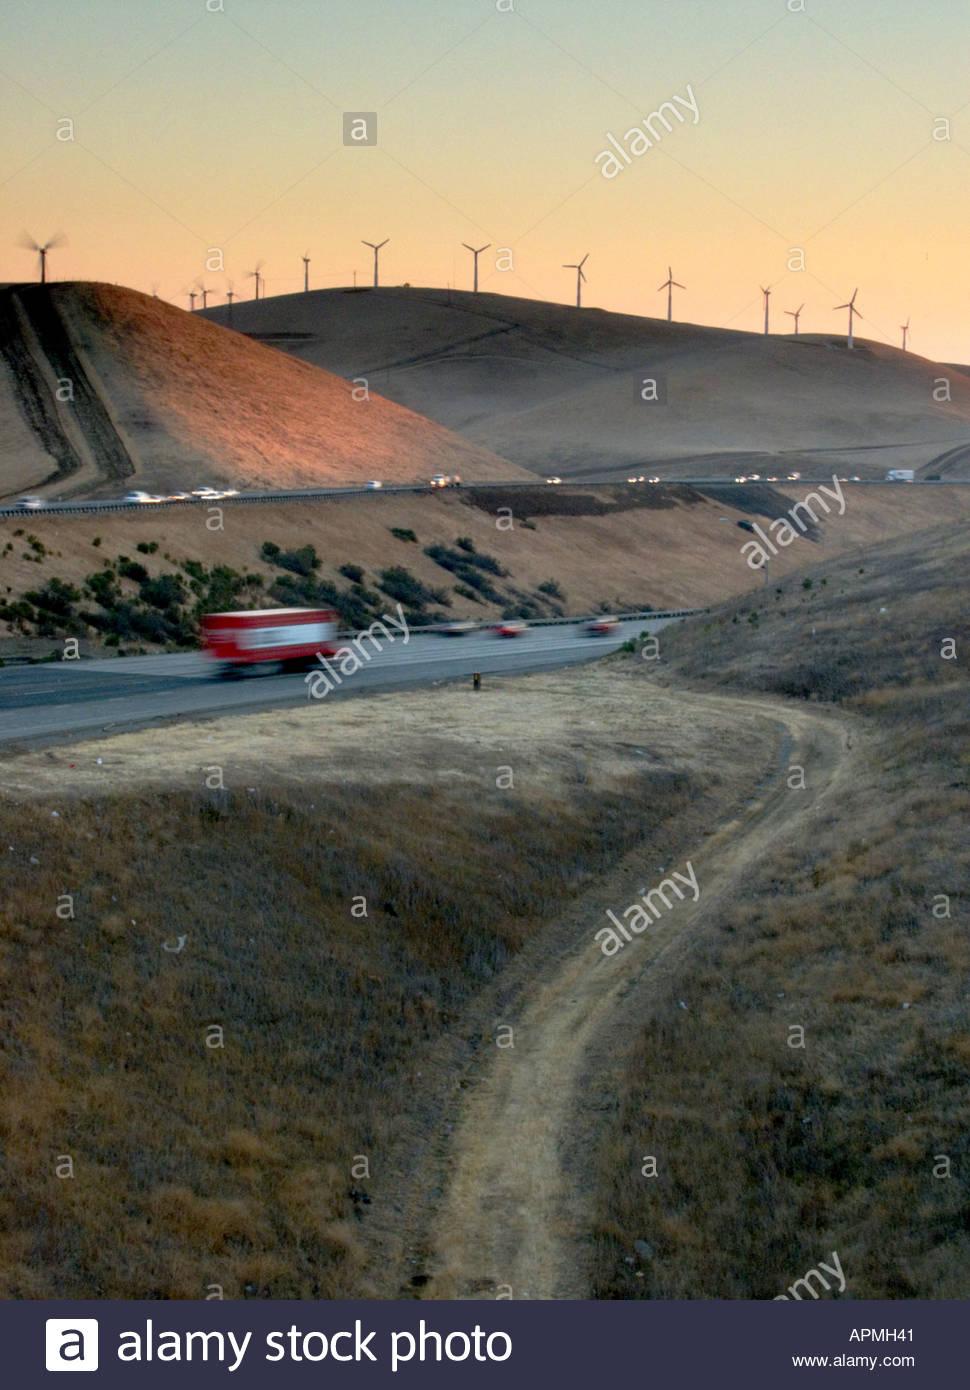 Morning Traffic Altamont Pass California Stock Photo: 5165376 - Alamy